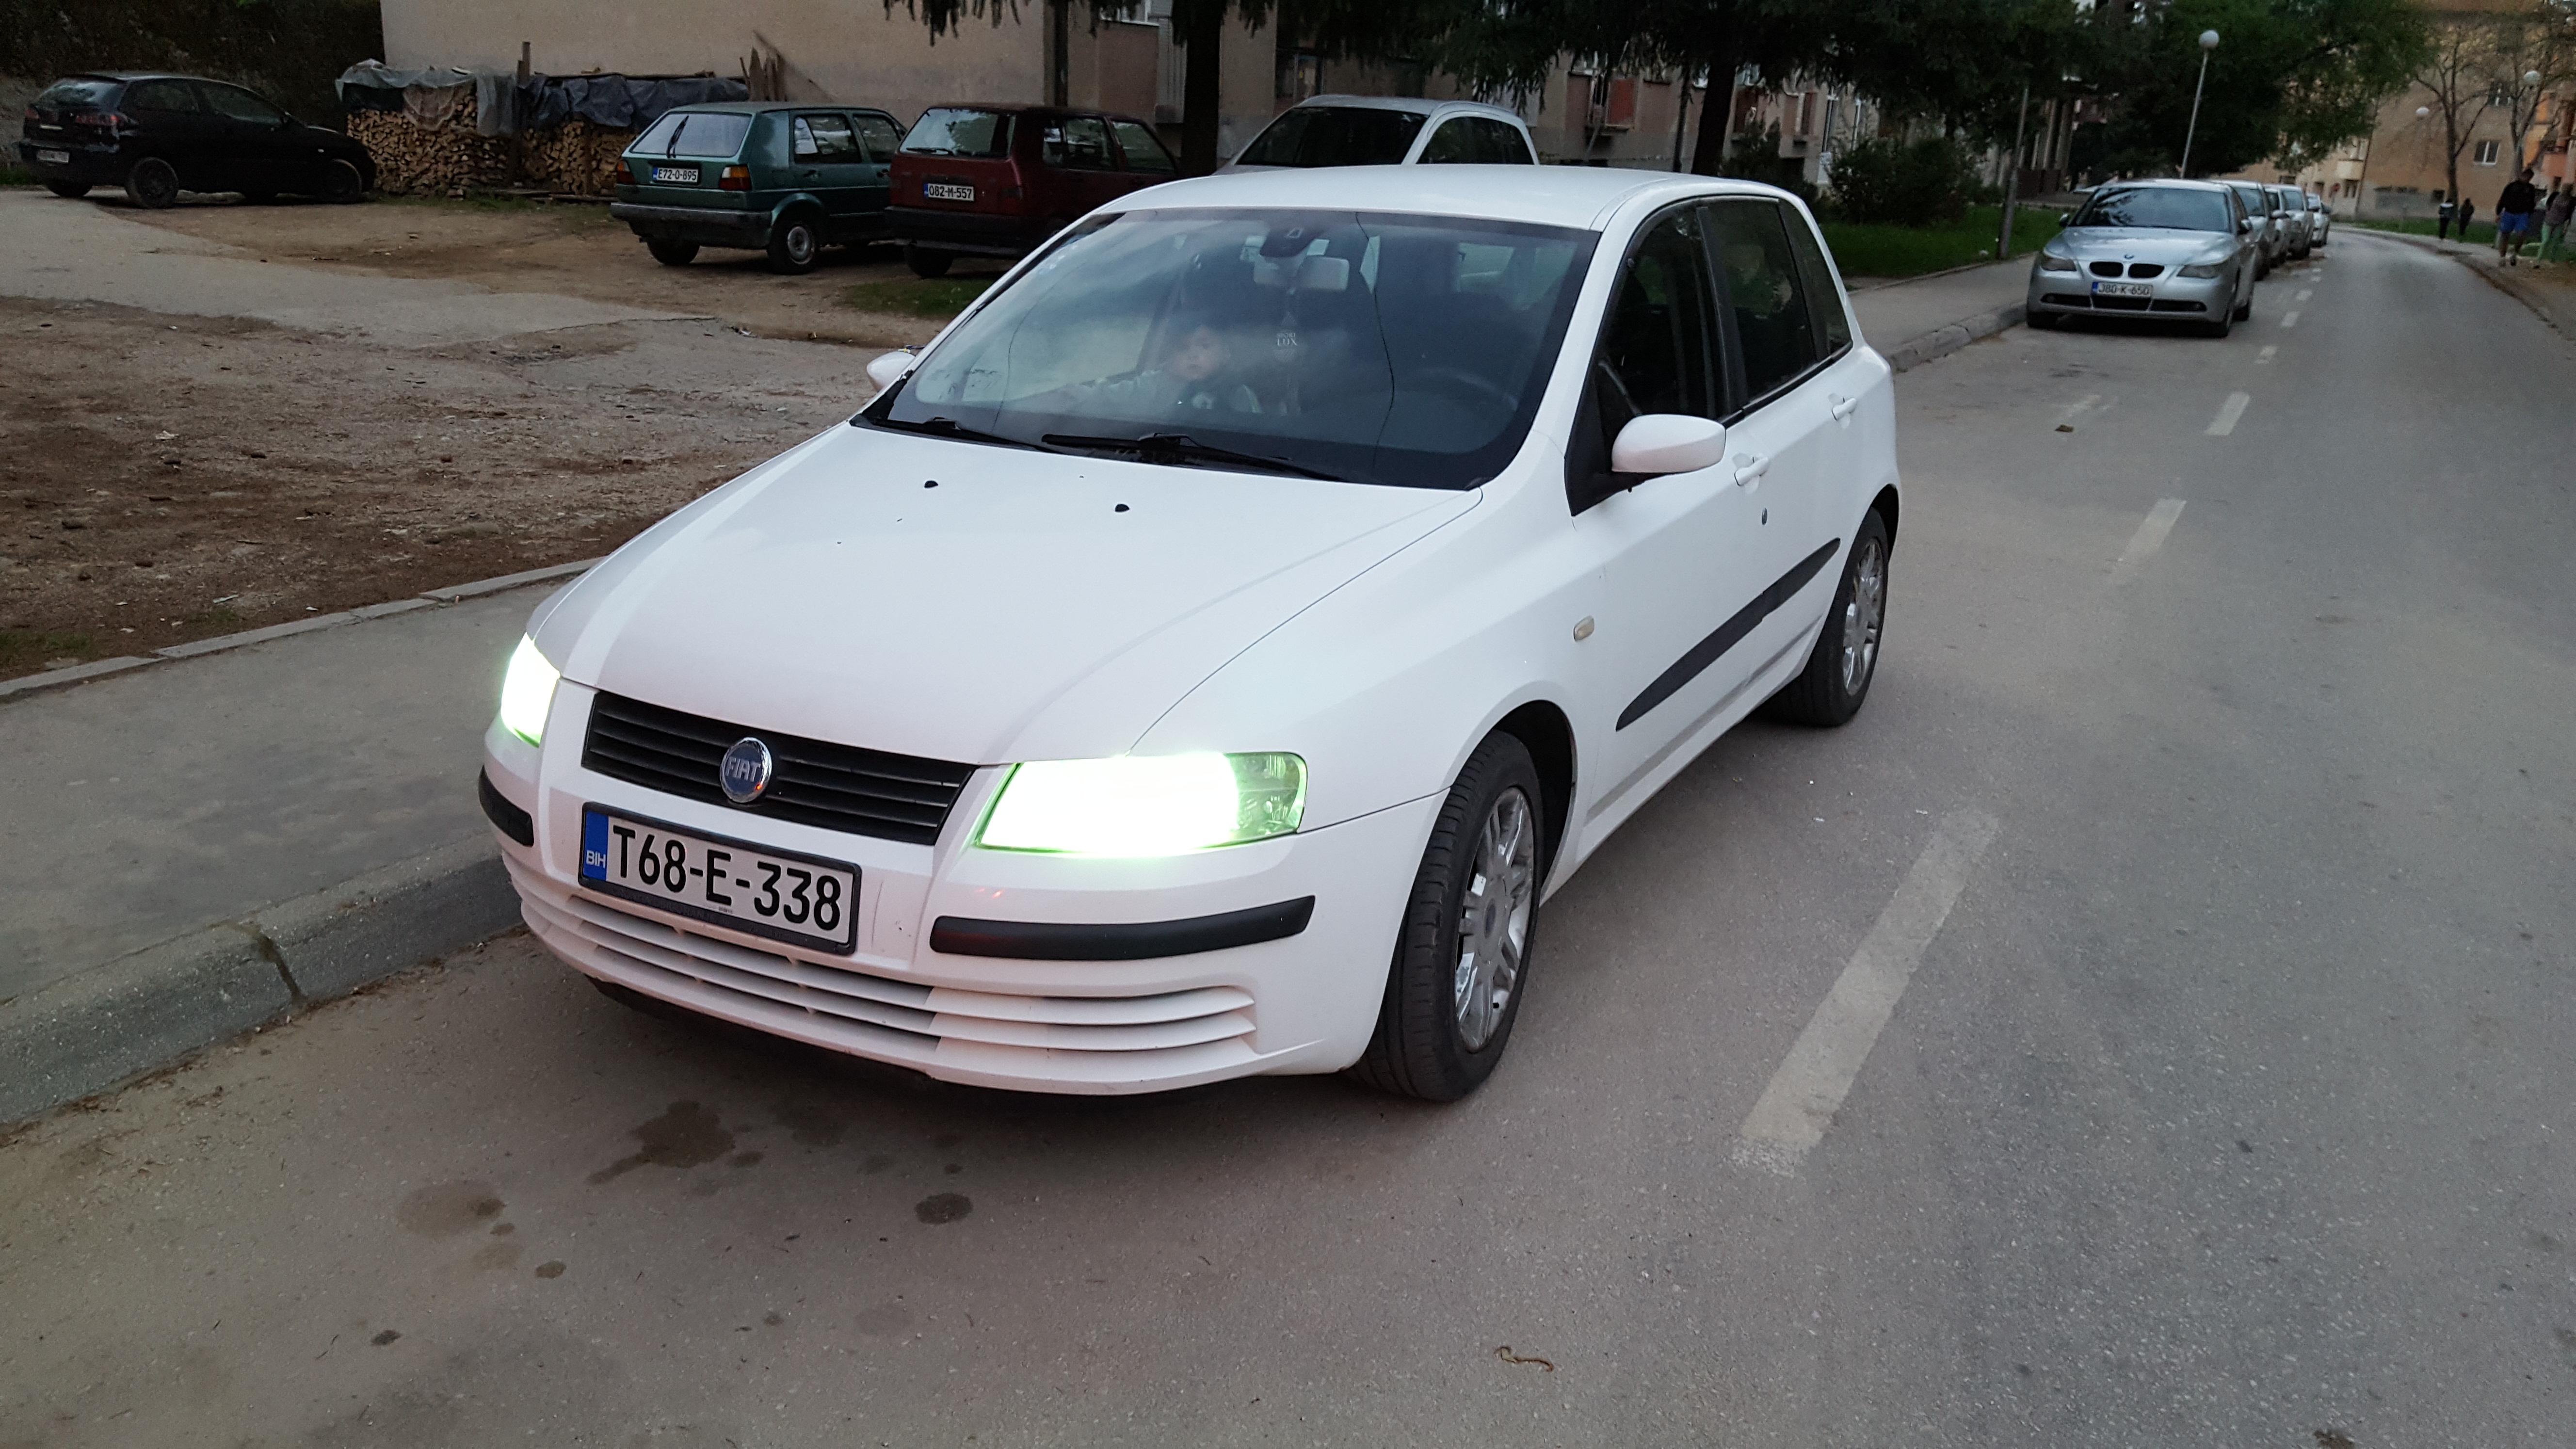 reputation from stojak - fiat-lancia club serbia forum